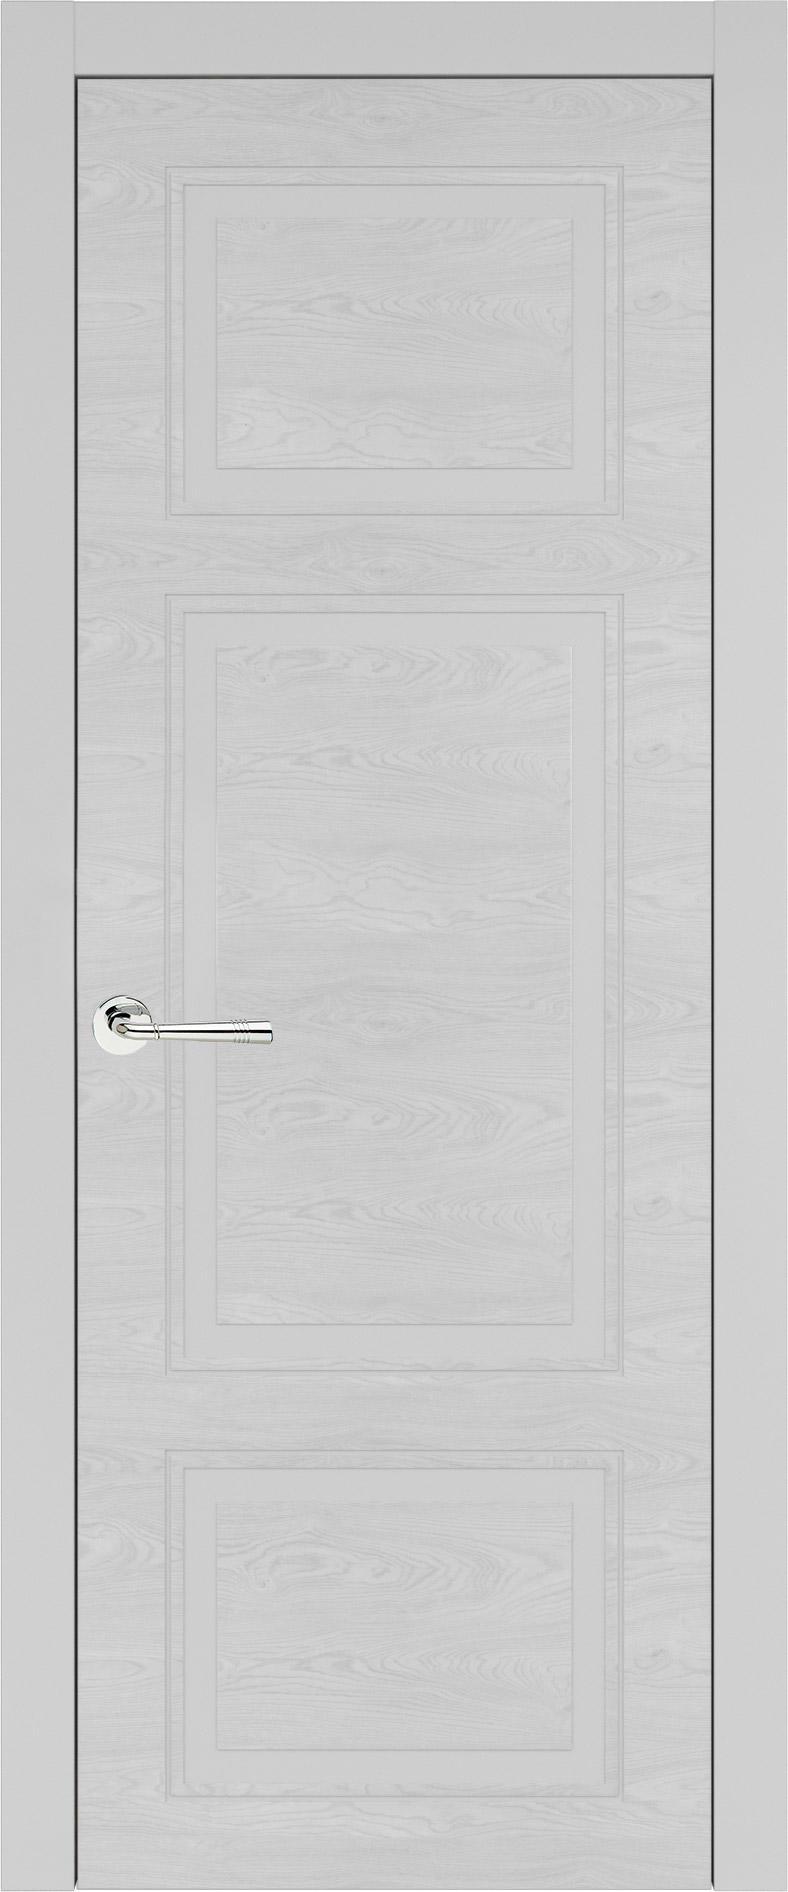 Siena Neo Classic цвет - Серая эмаль по шпону (RAL 7047) Без стекла (ДГ)